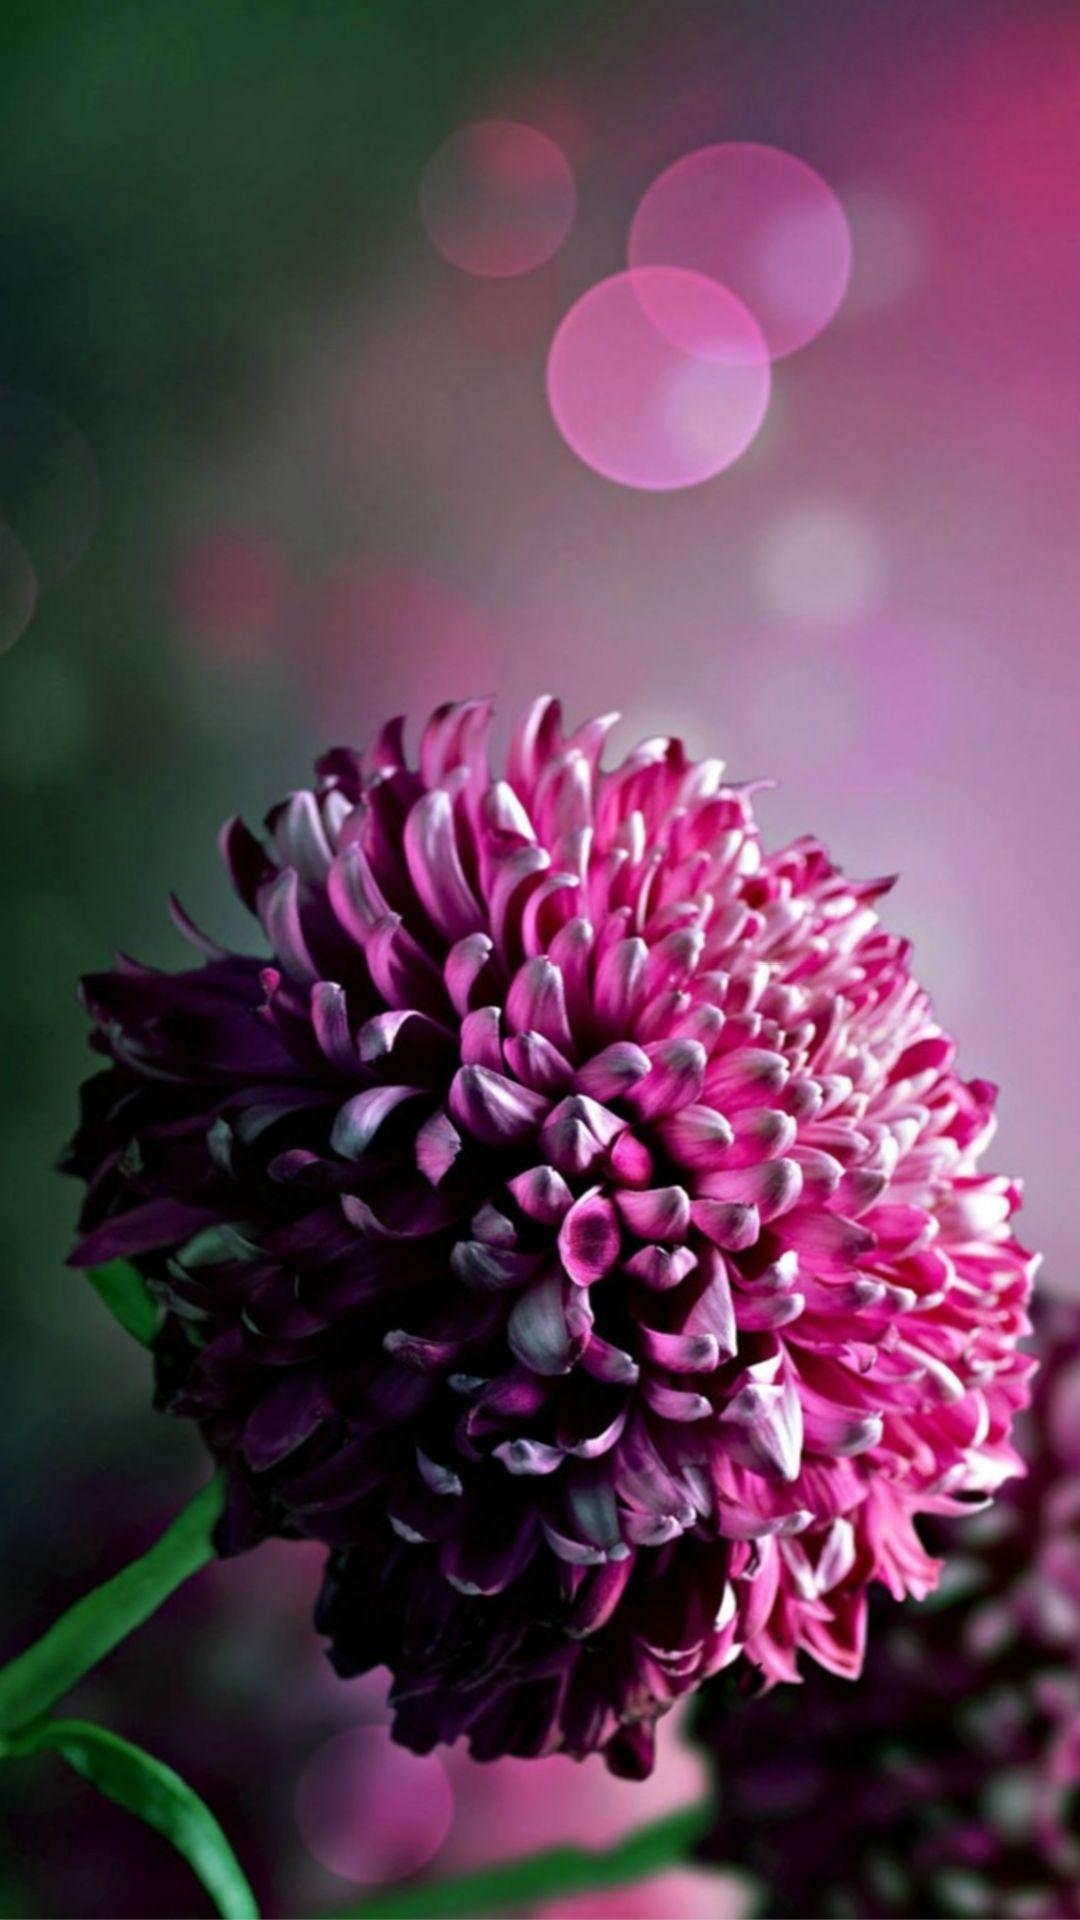 Wallpaper download iphone 6 - Hydrangea Chrysanthemum Flower Macro Bokeh Iphone 6 Wallpaper